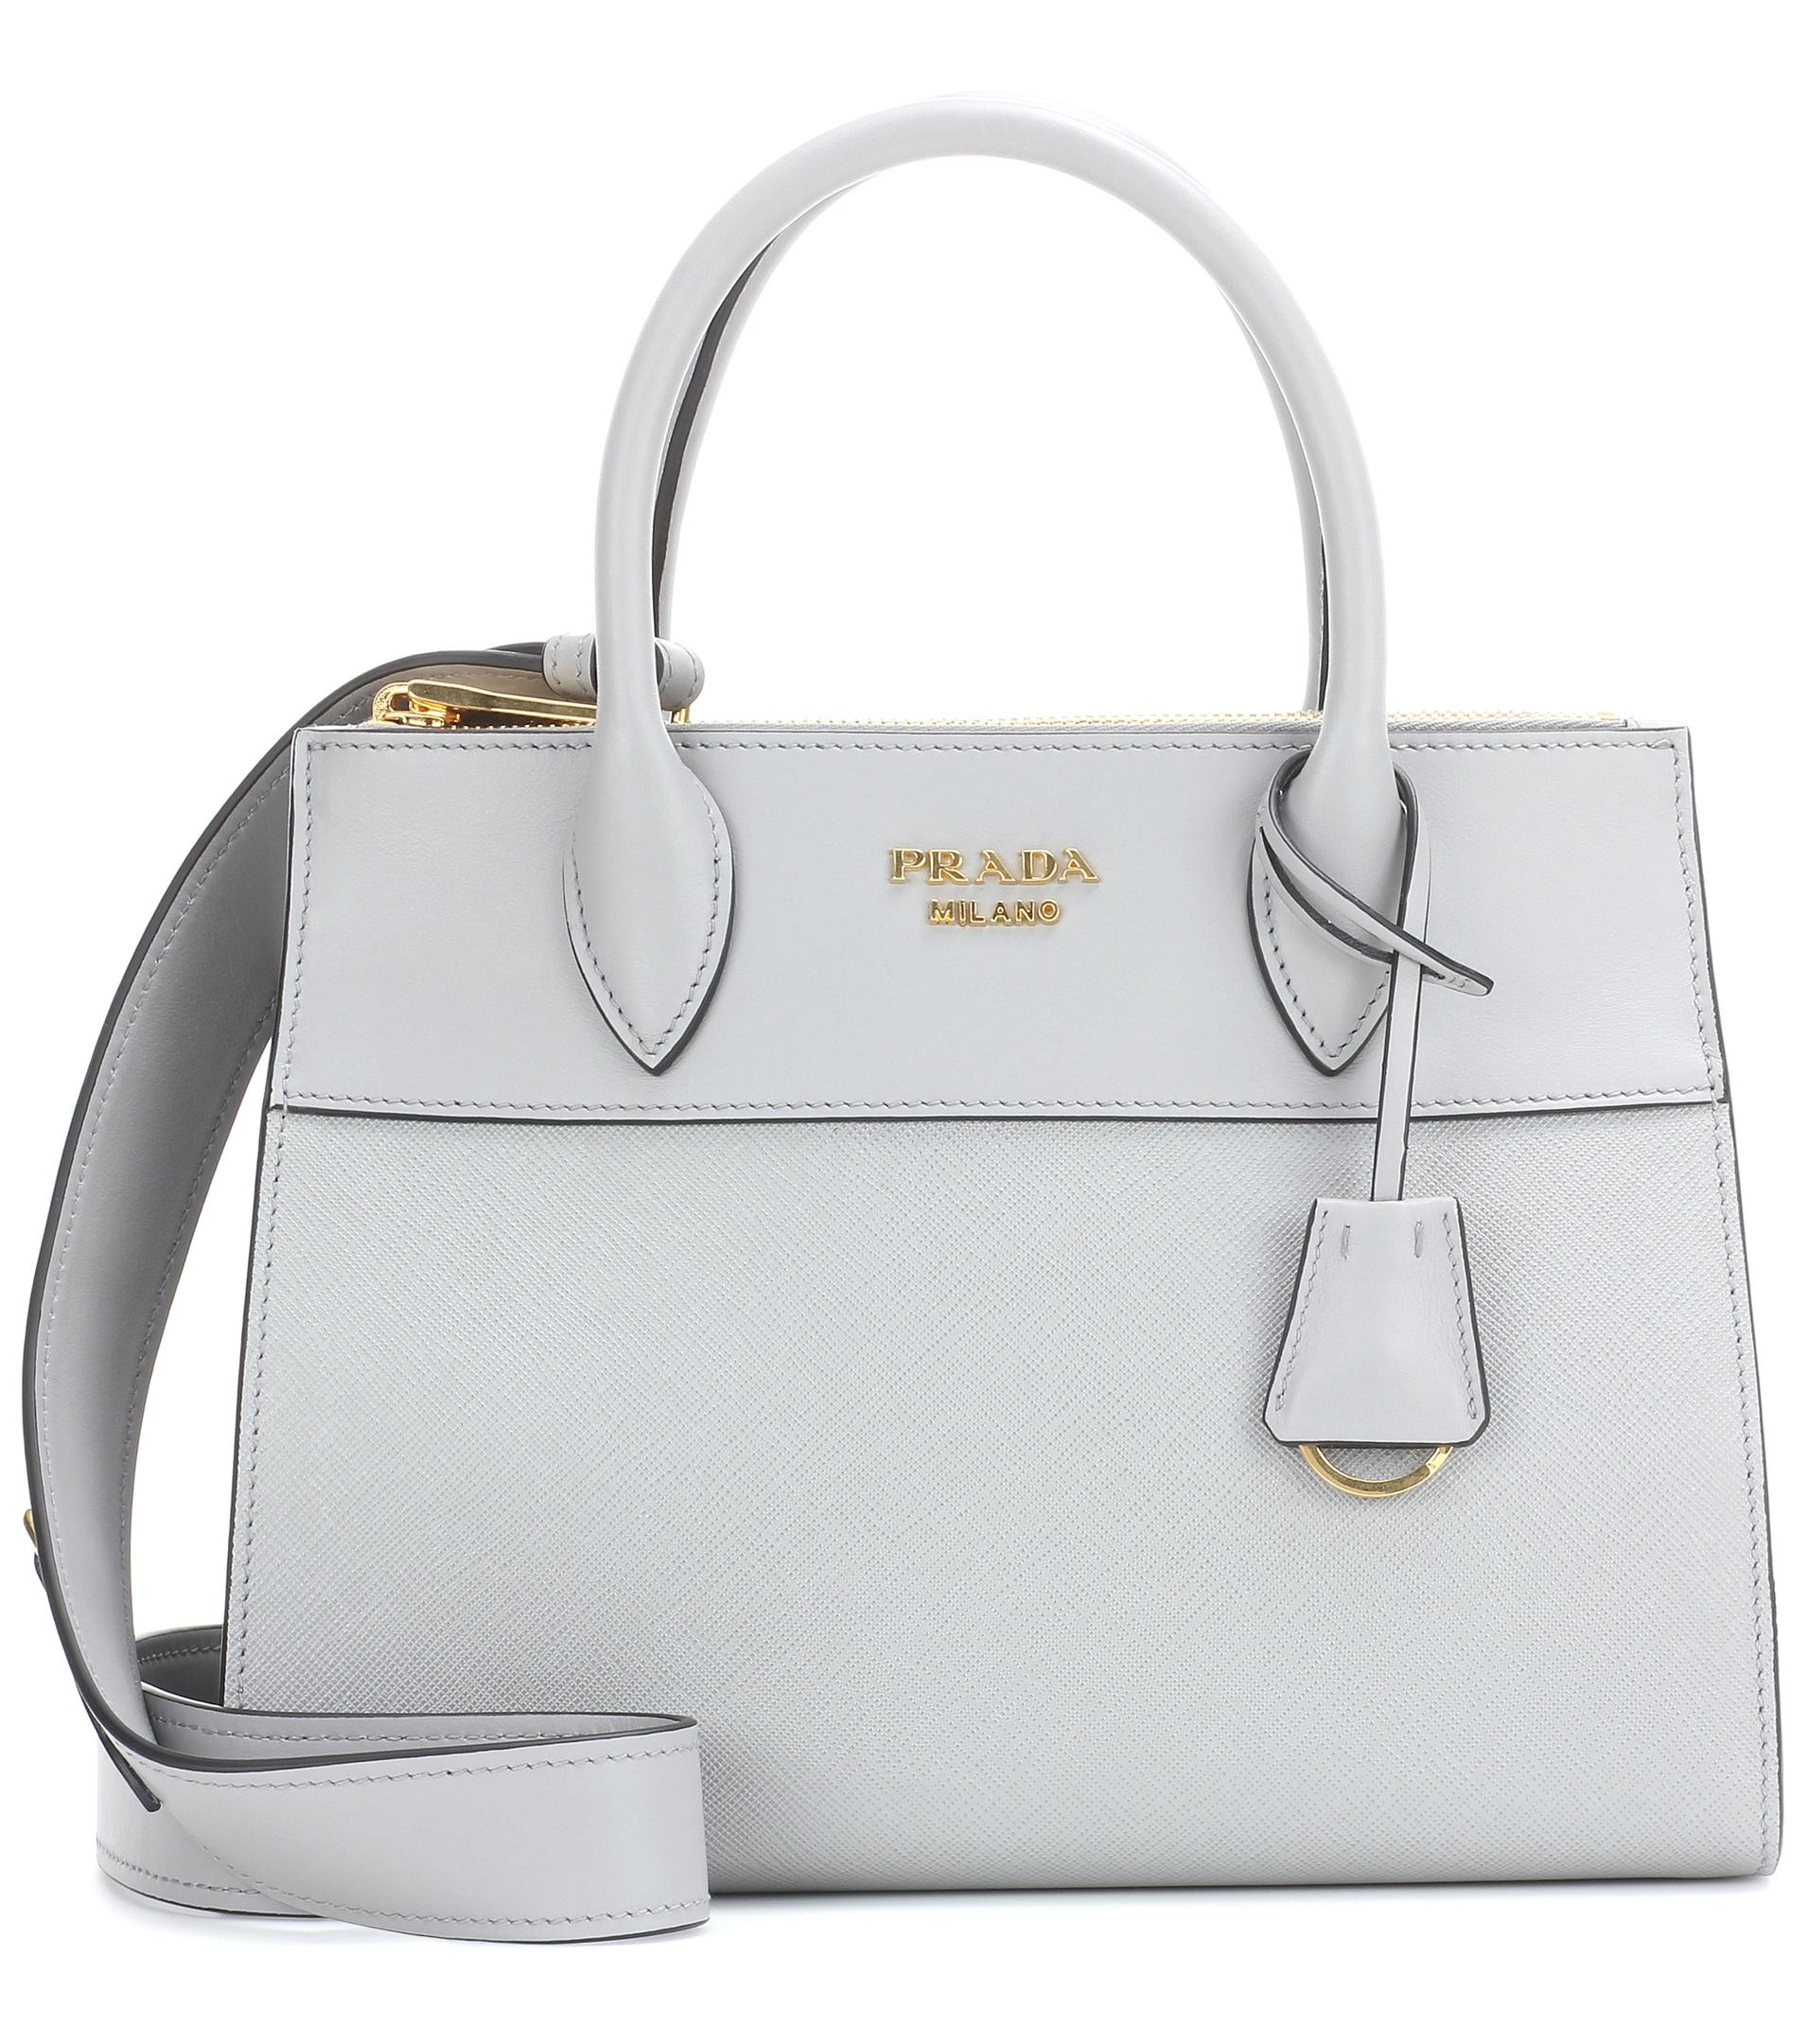 0803764863f6 Prada Paradigme Leather Handbag in Gray - Lyst